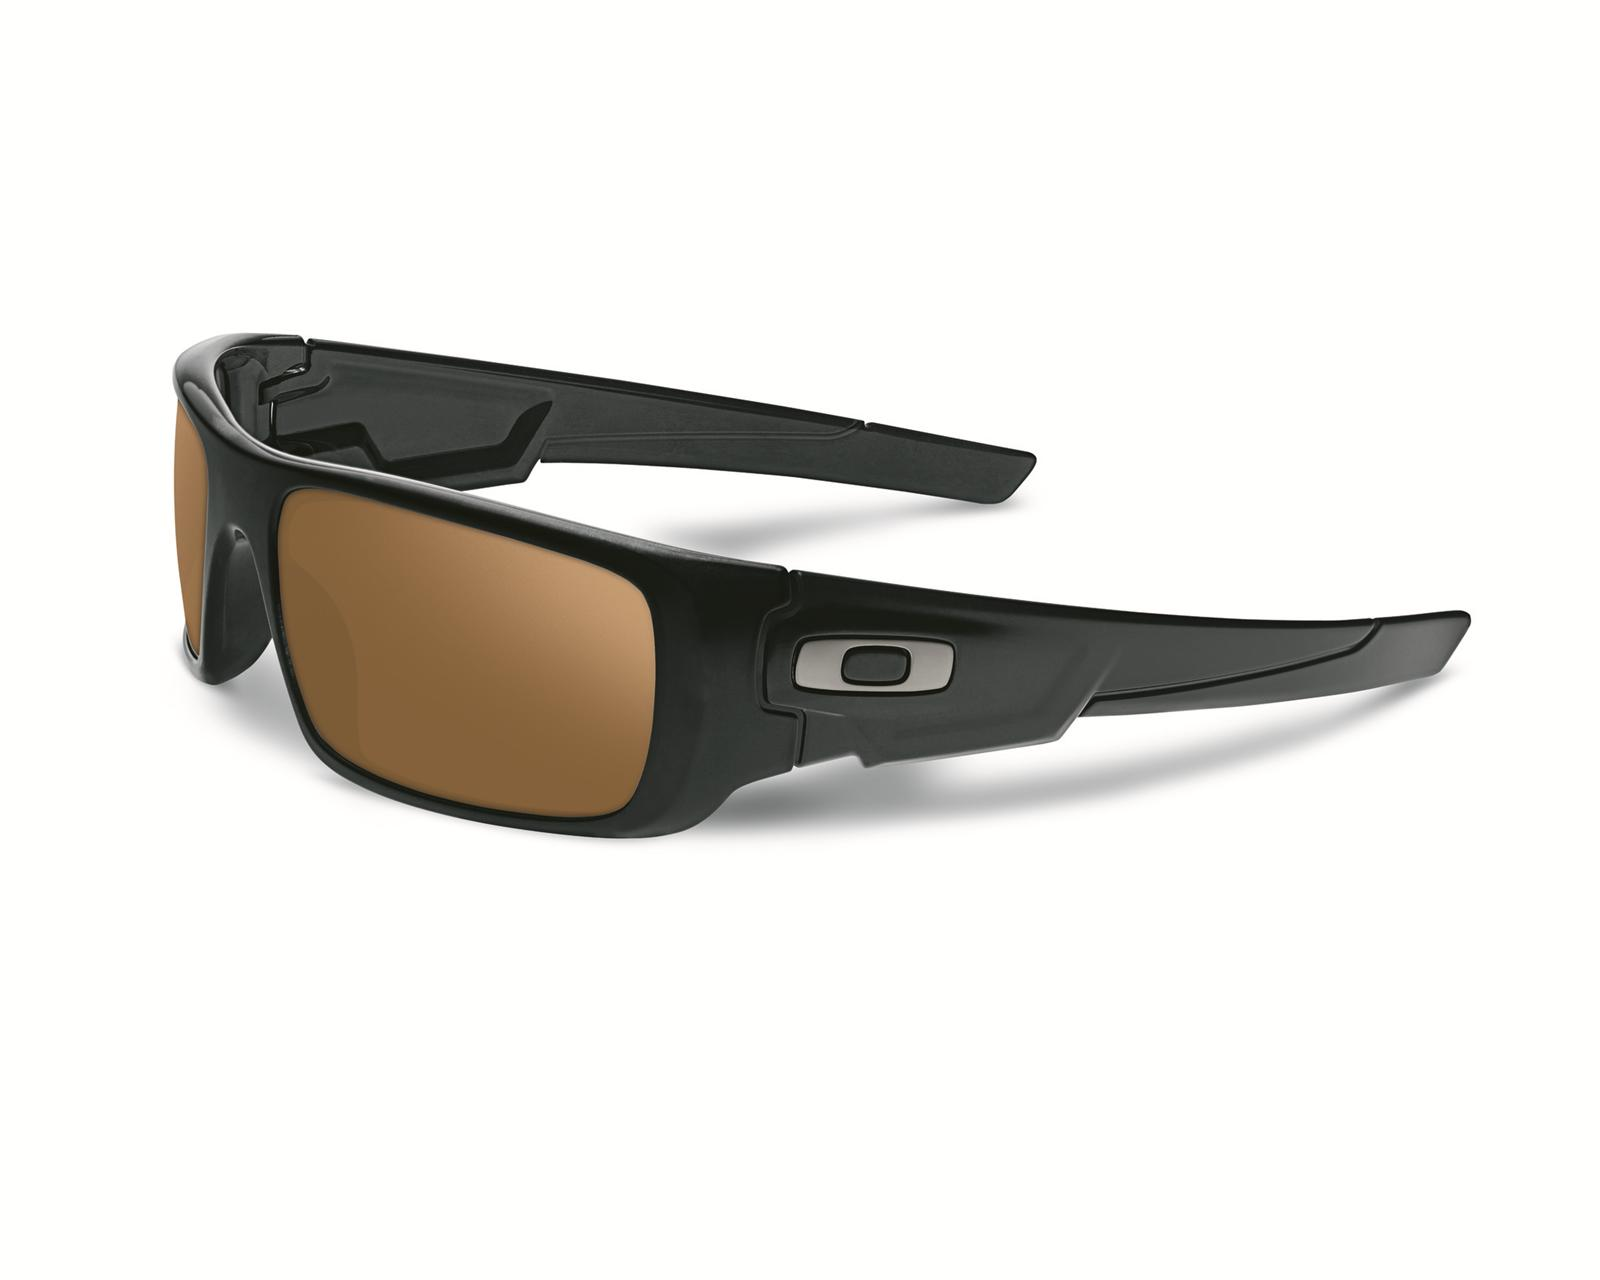 42e8b4cc66 Oakley Crankshaft Sunglasses OO9239-03 - Free Shipping on Orders Over  99  at Summit Racing